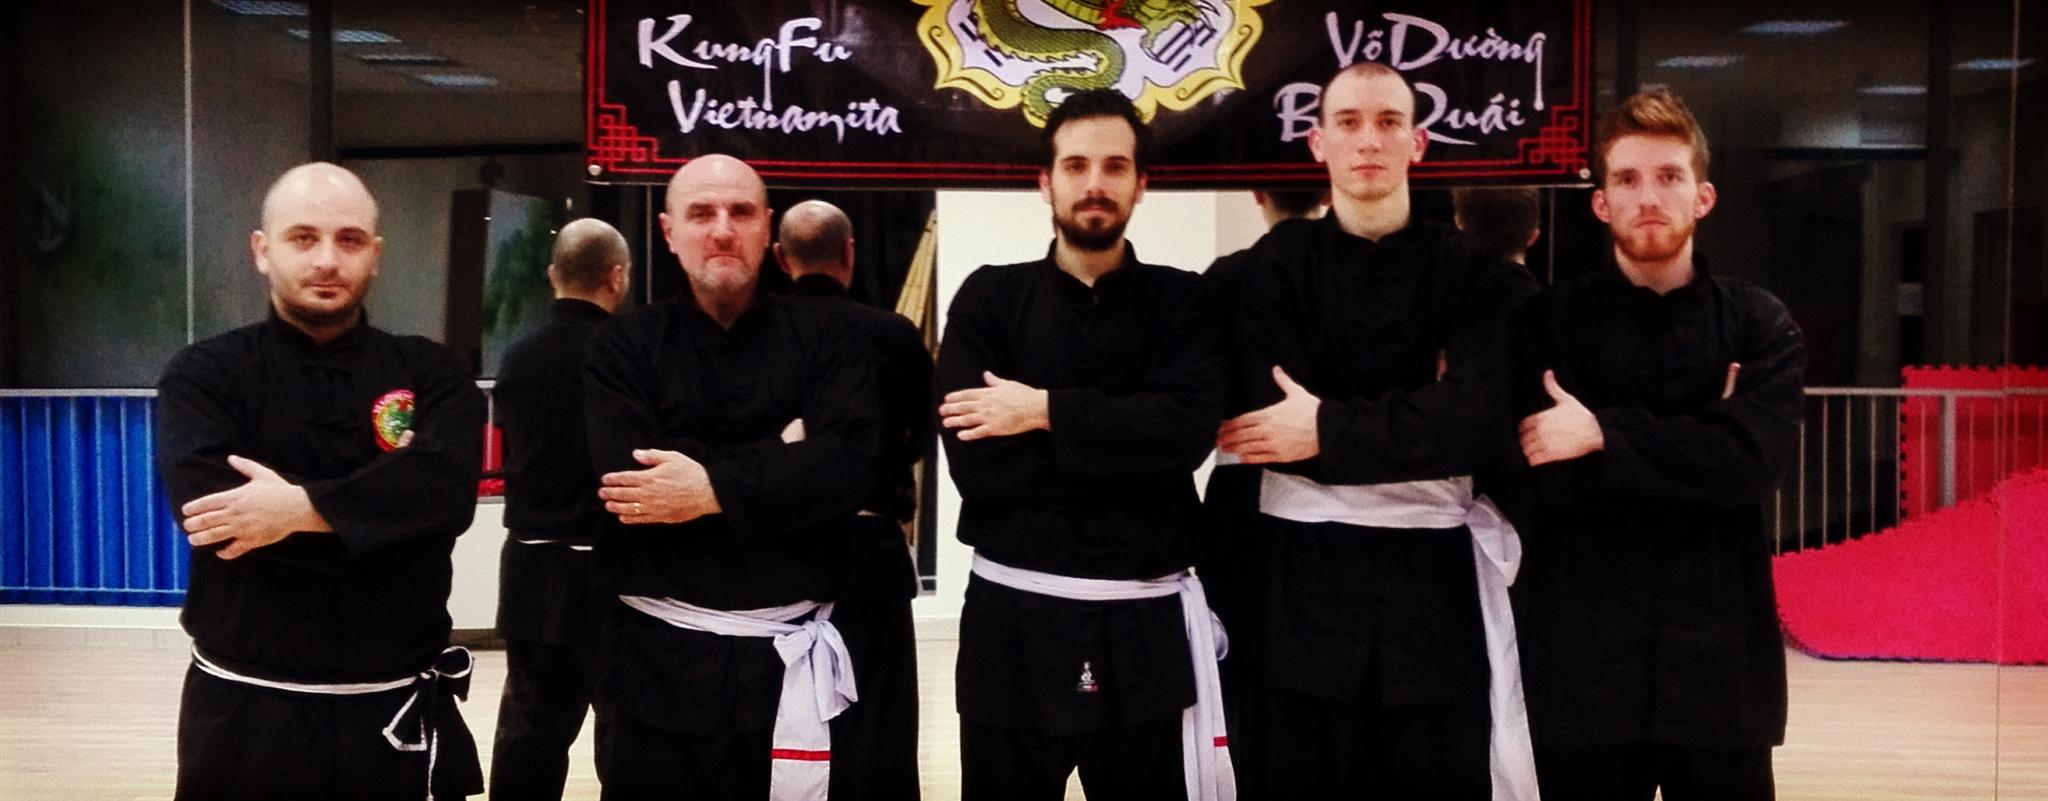 Scuola Kung fu Milano 5